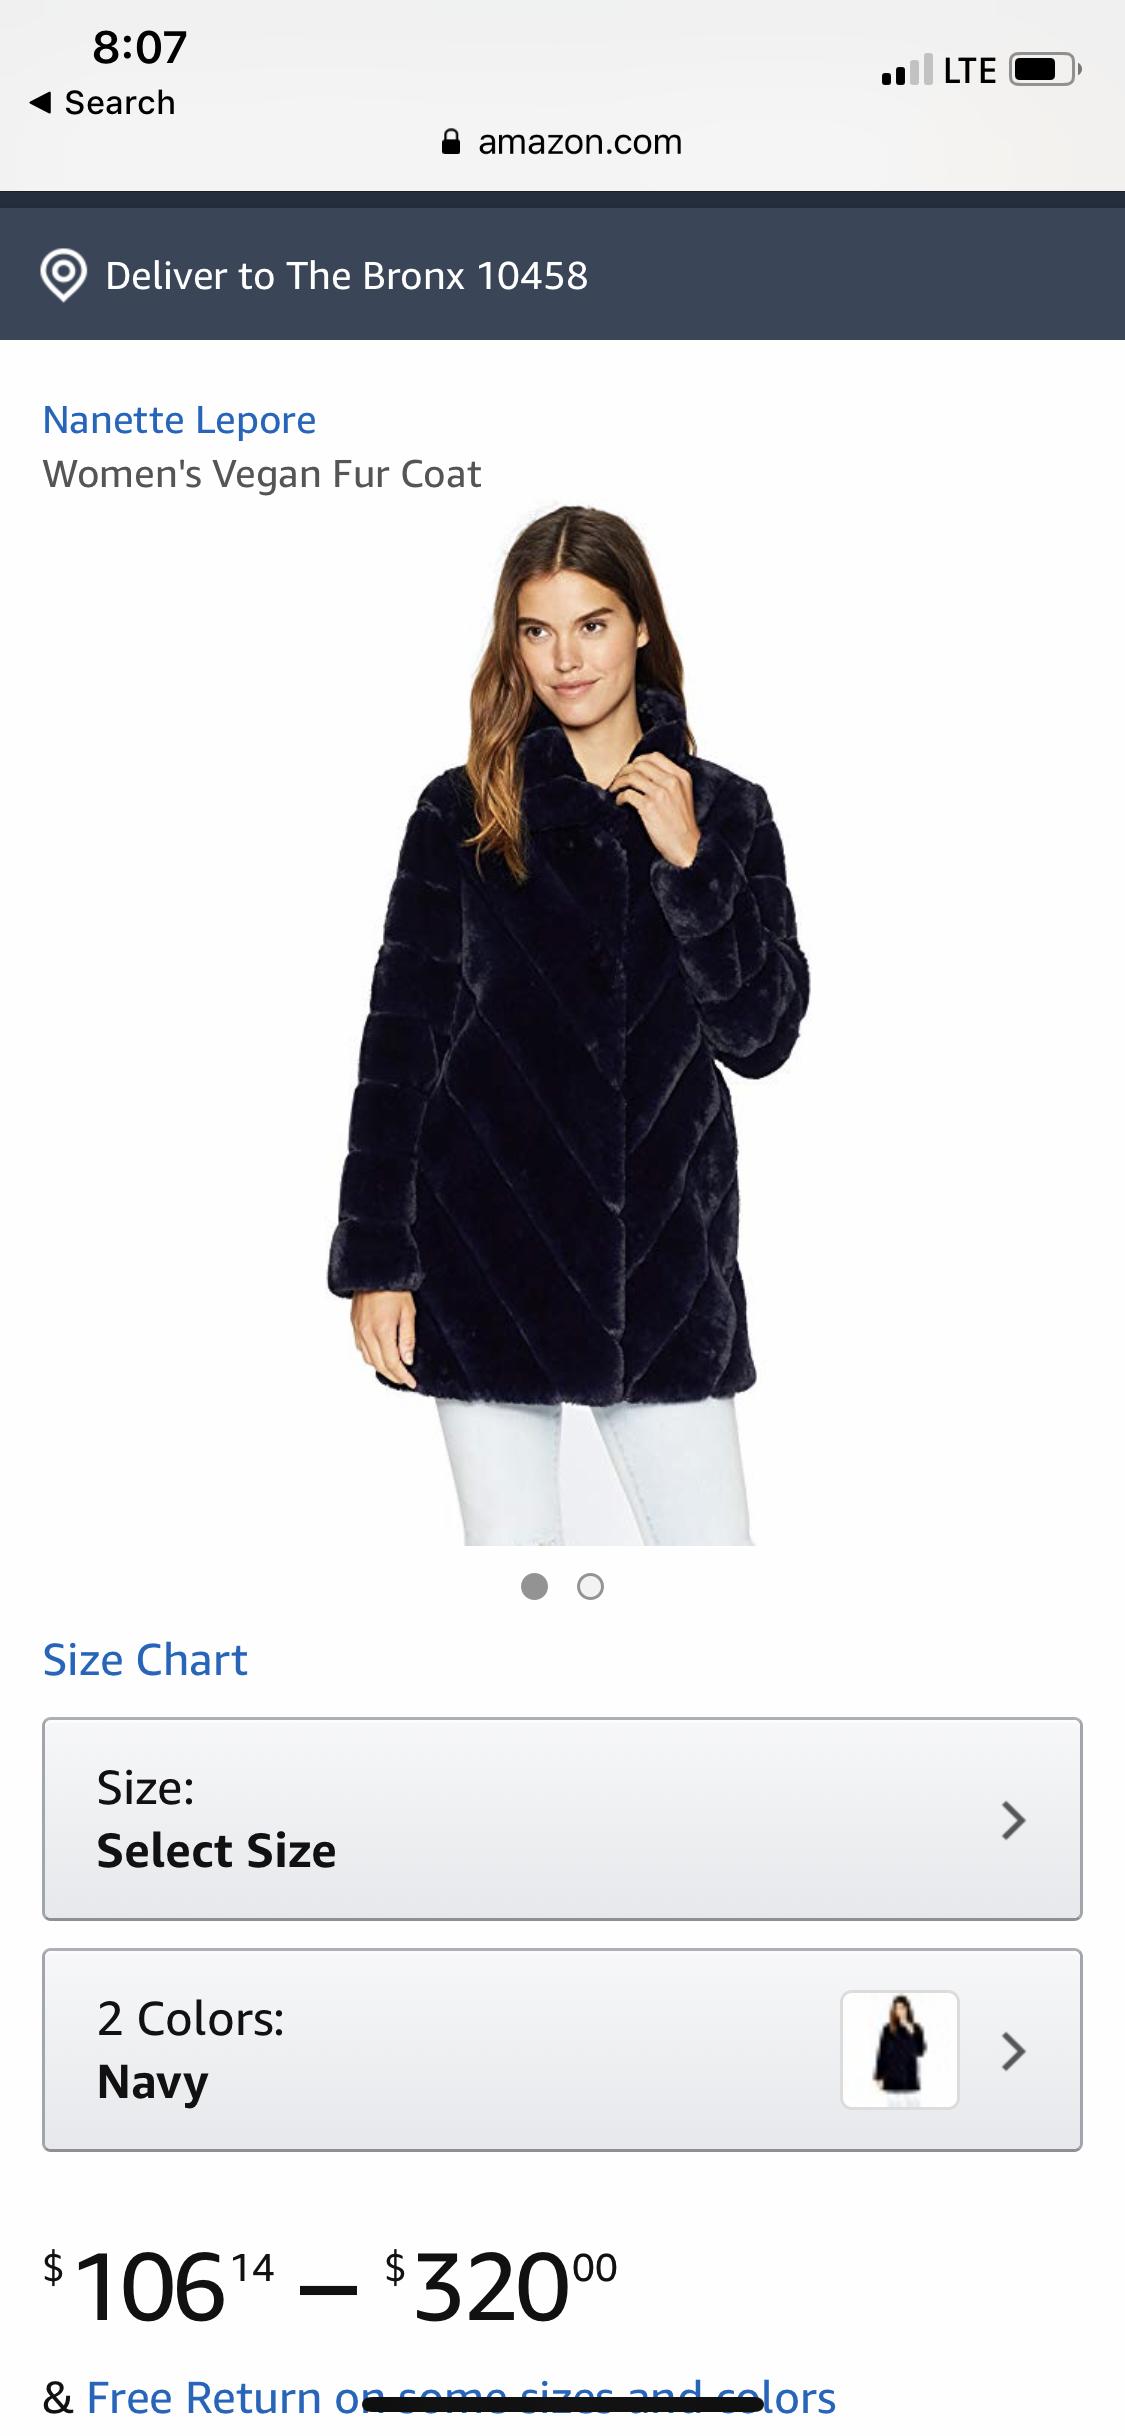 Pin By Sammy Tegtmeyer On Coats With Images Vegan Fur Coat Fur Coat